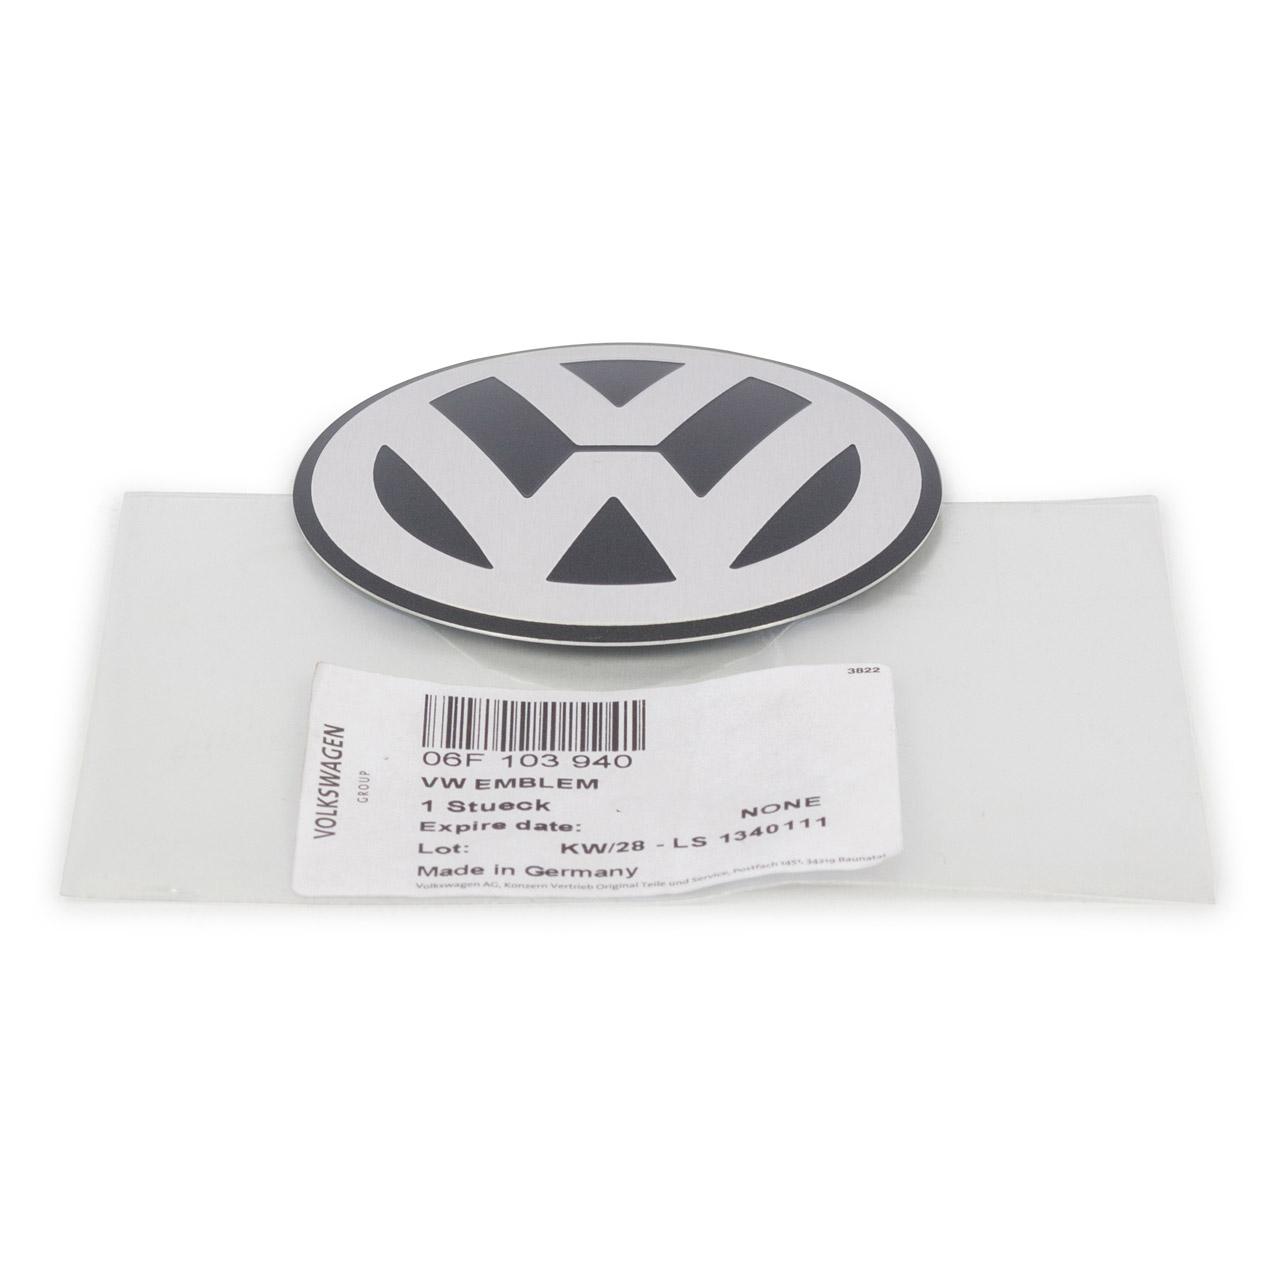 ORIGINAL VW Emblem Logo Motoabdeckung Caddy 3 Golf 6 Jetta Passat Tiguan Touran 06F103940